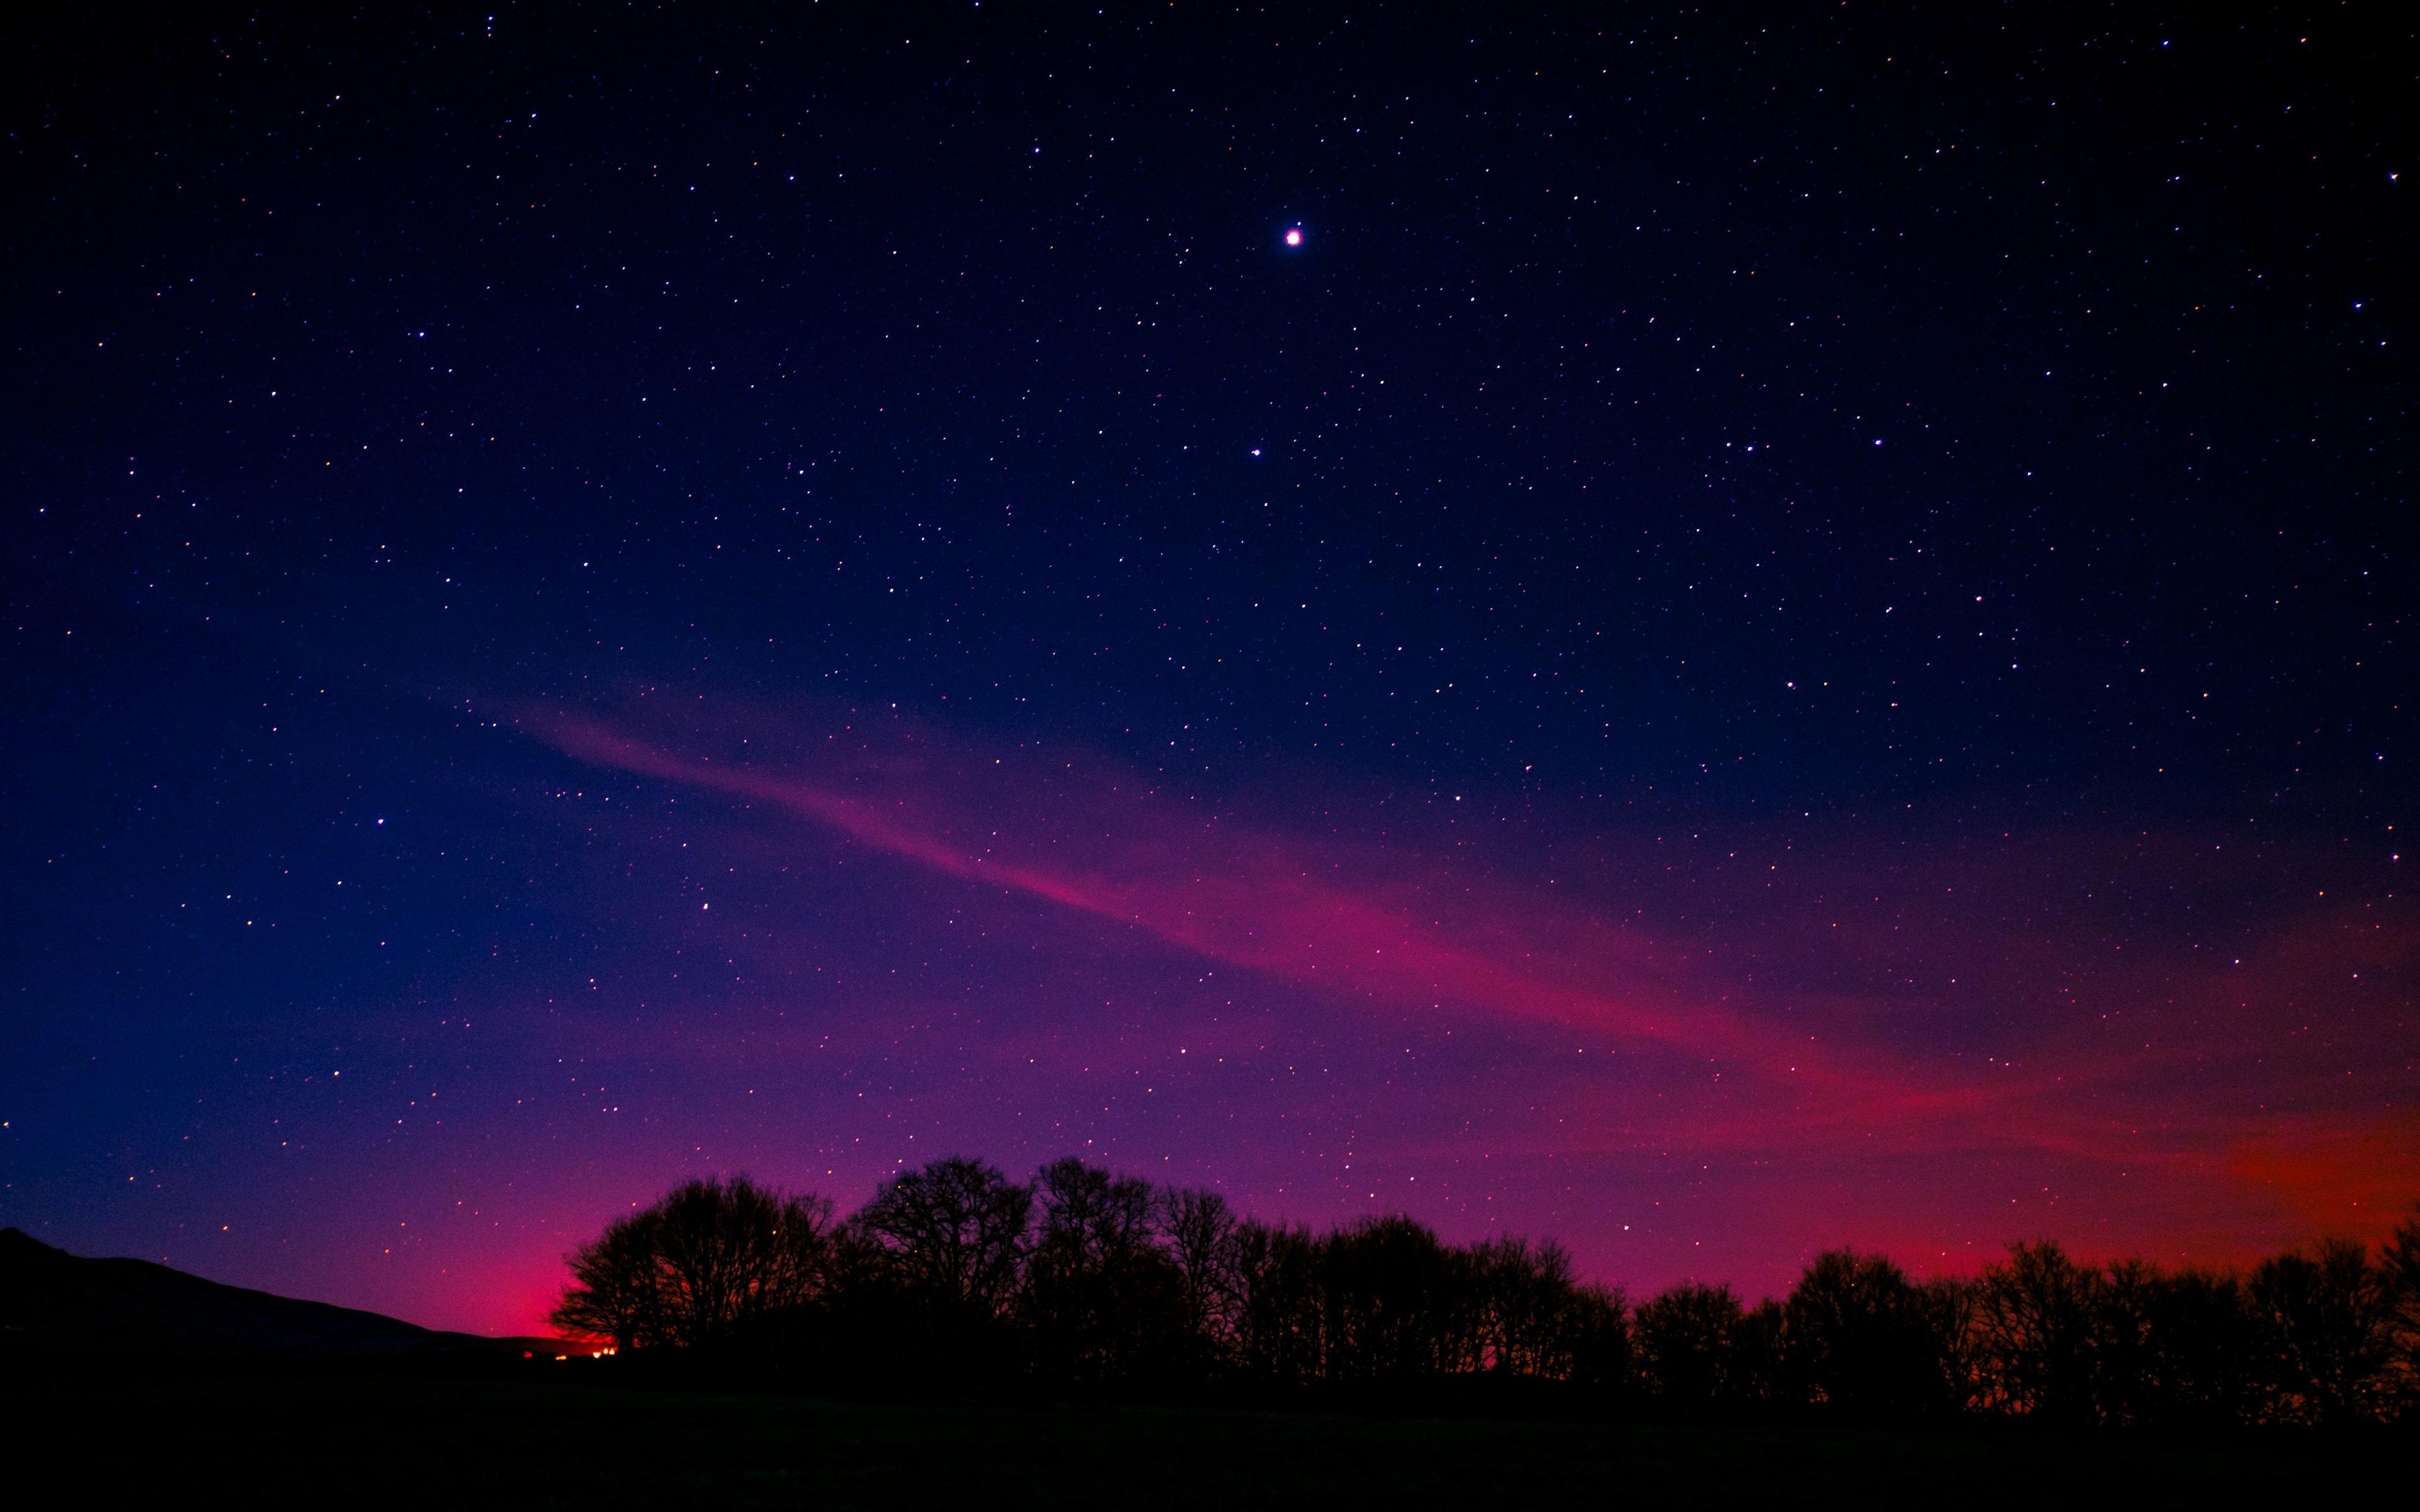 Download 3840x2400 Wallpaper Blue Pink Sky Starry Night Nature 4k